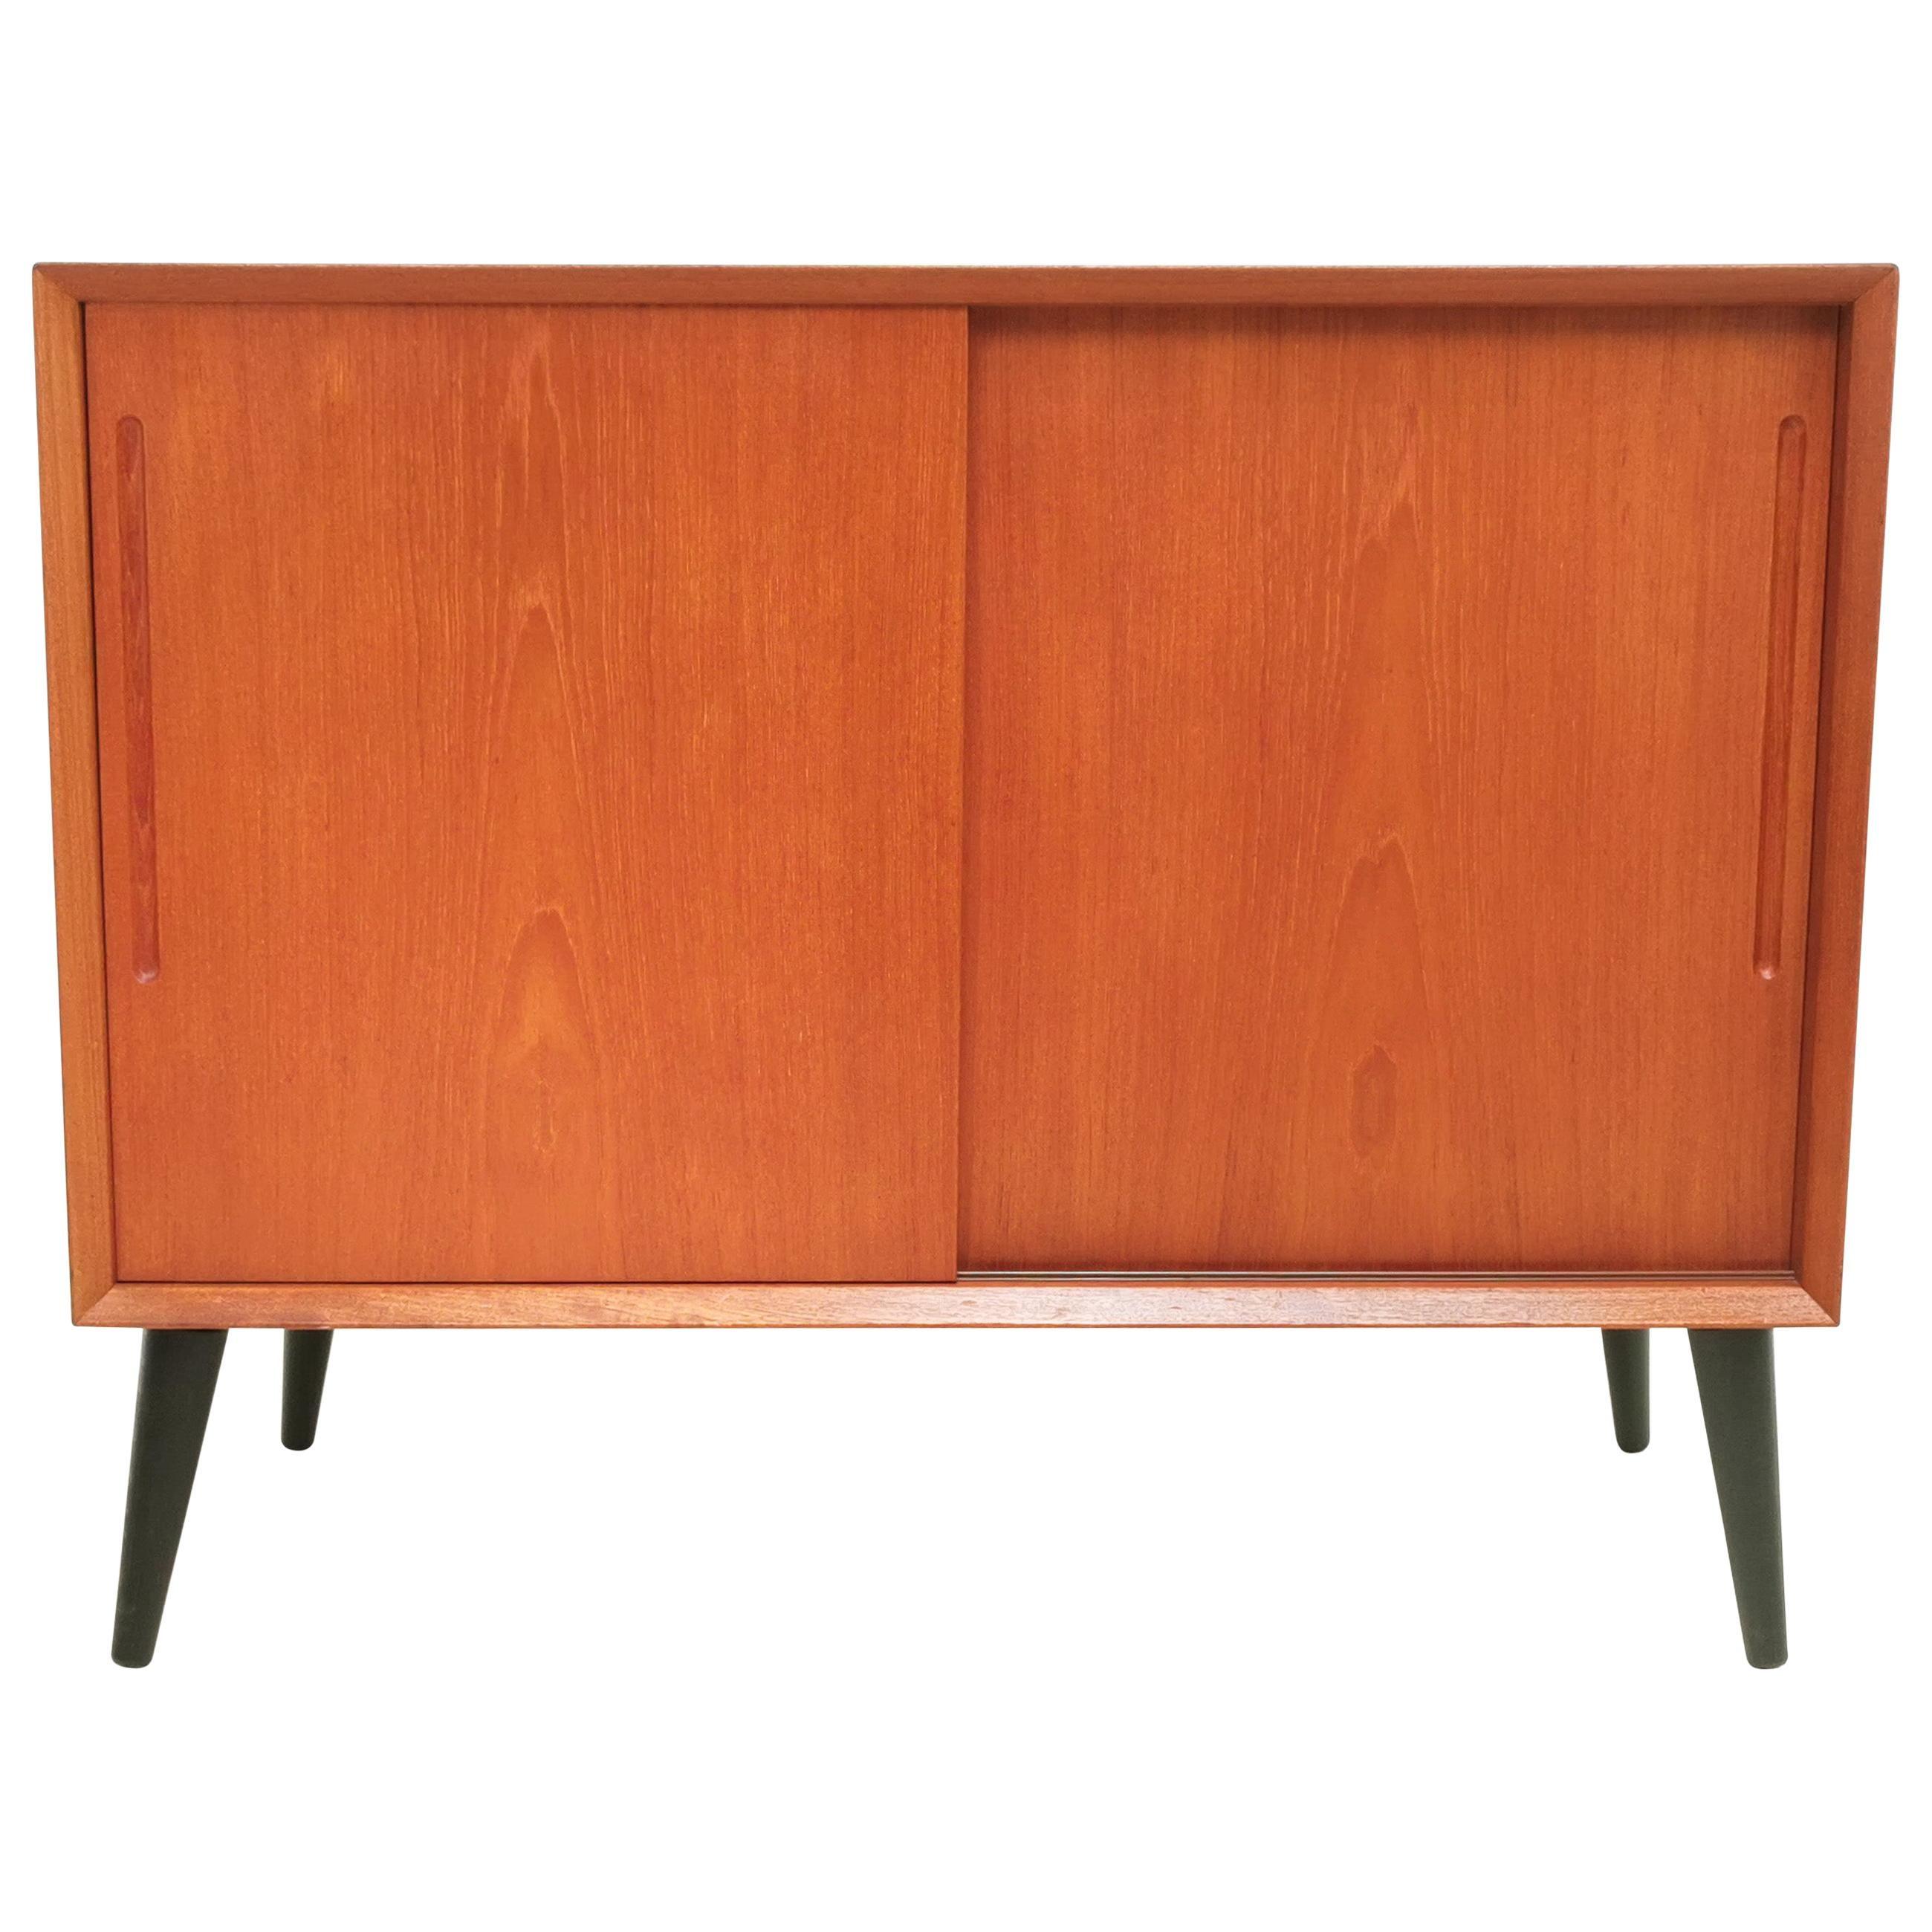 Danish Teak Sideboard Cabinet, Mid Century, 1970s